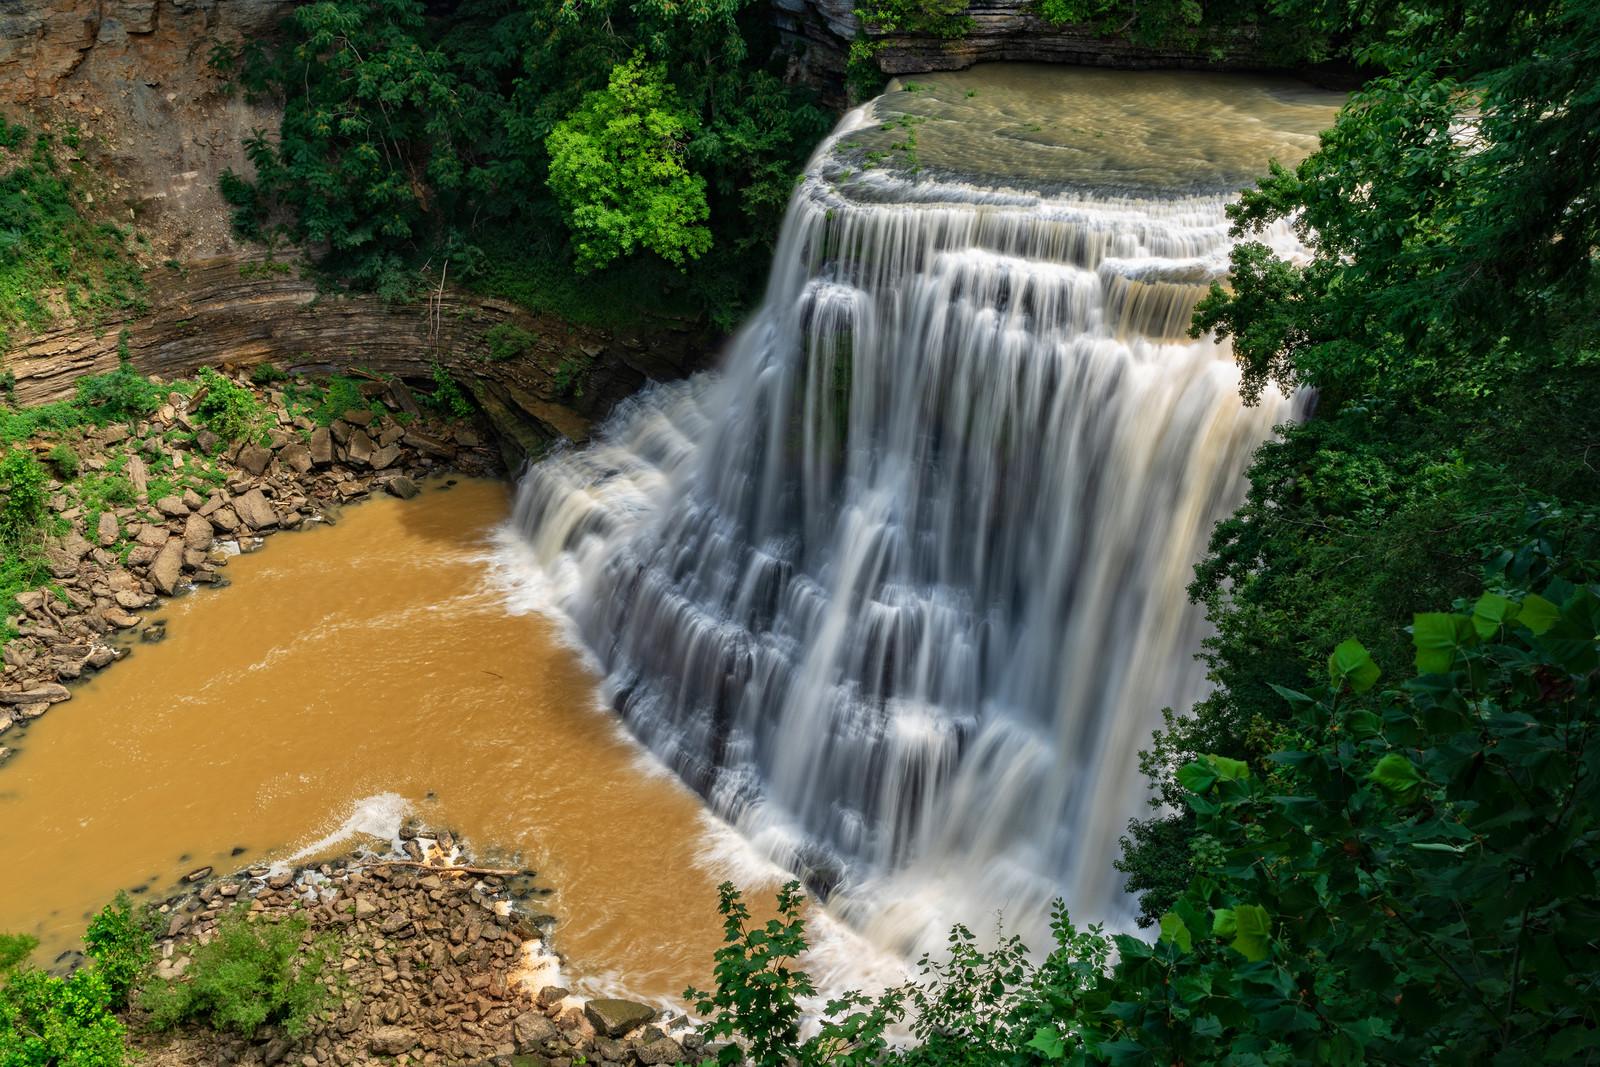 Big Falls at Burgess Falls state park in Sparta